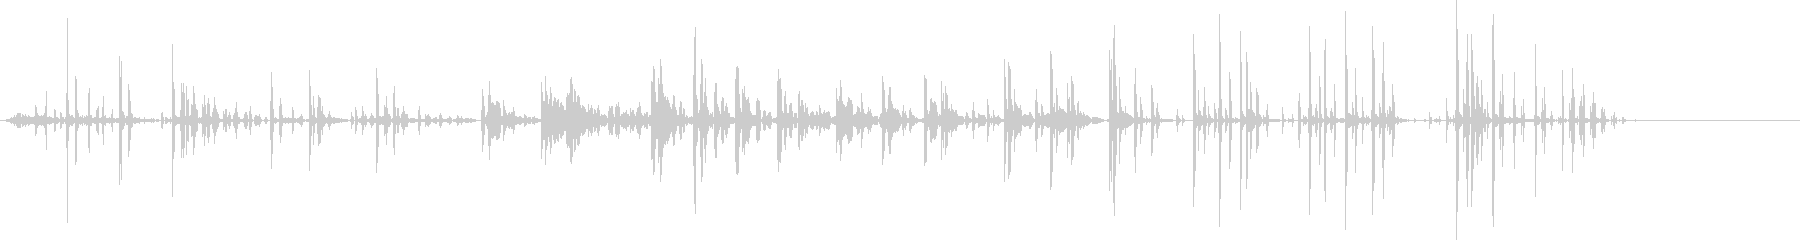 【SF】【機械】 奇妙な音_09 バグの未再生の波形